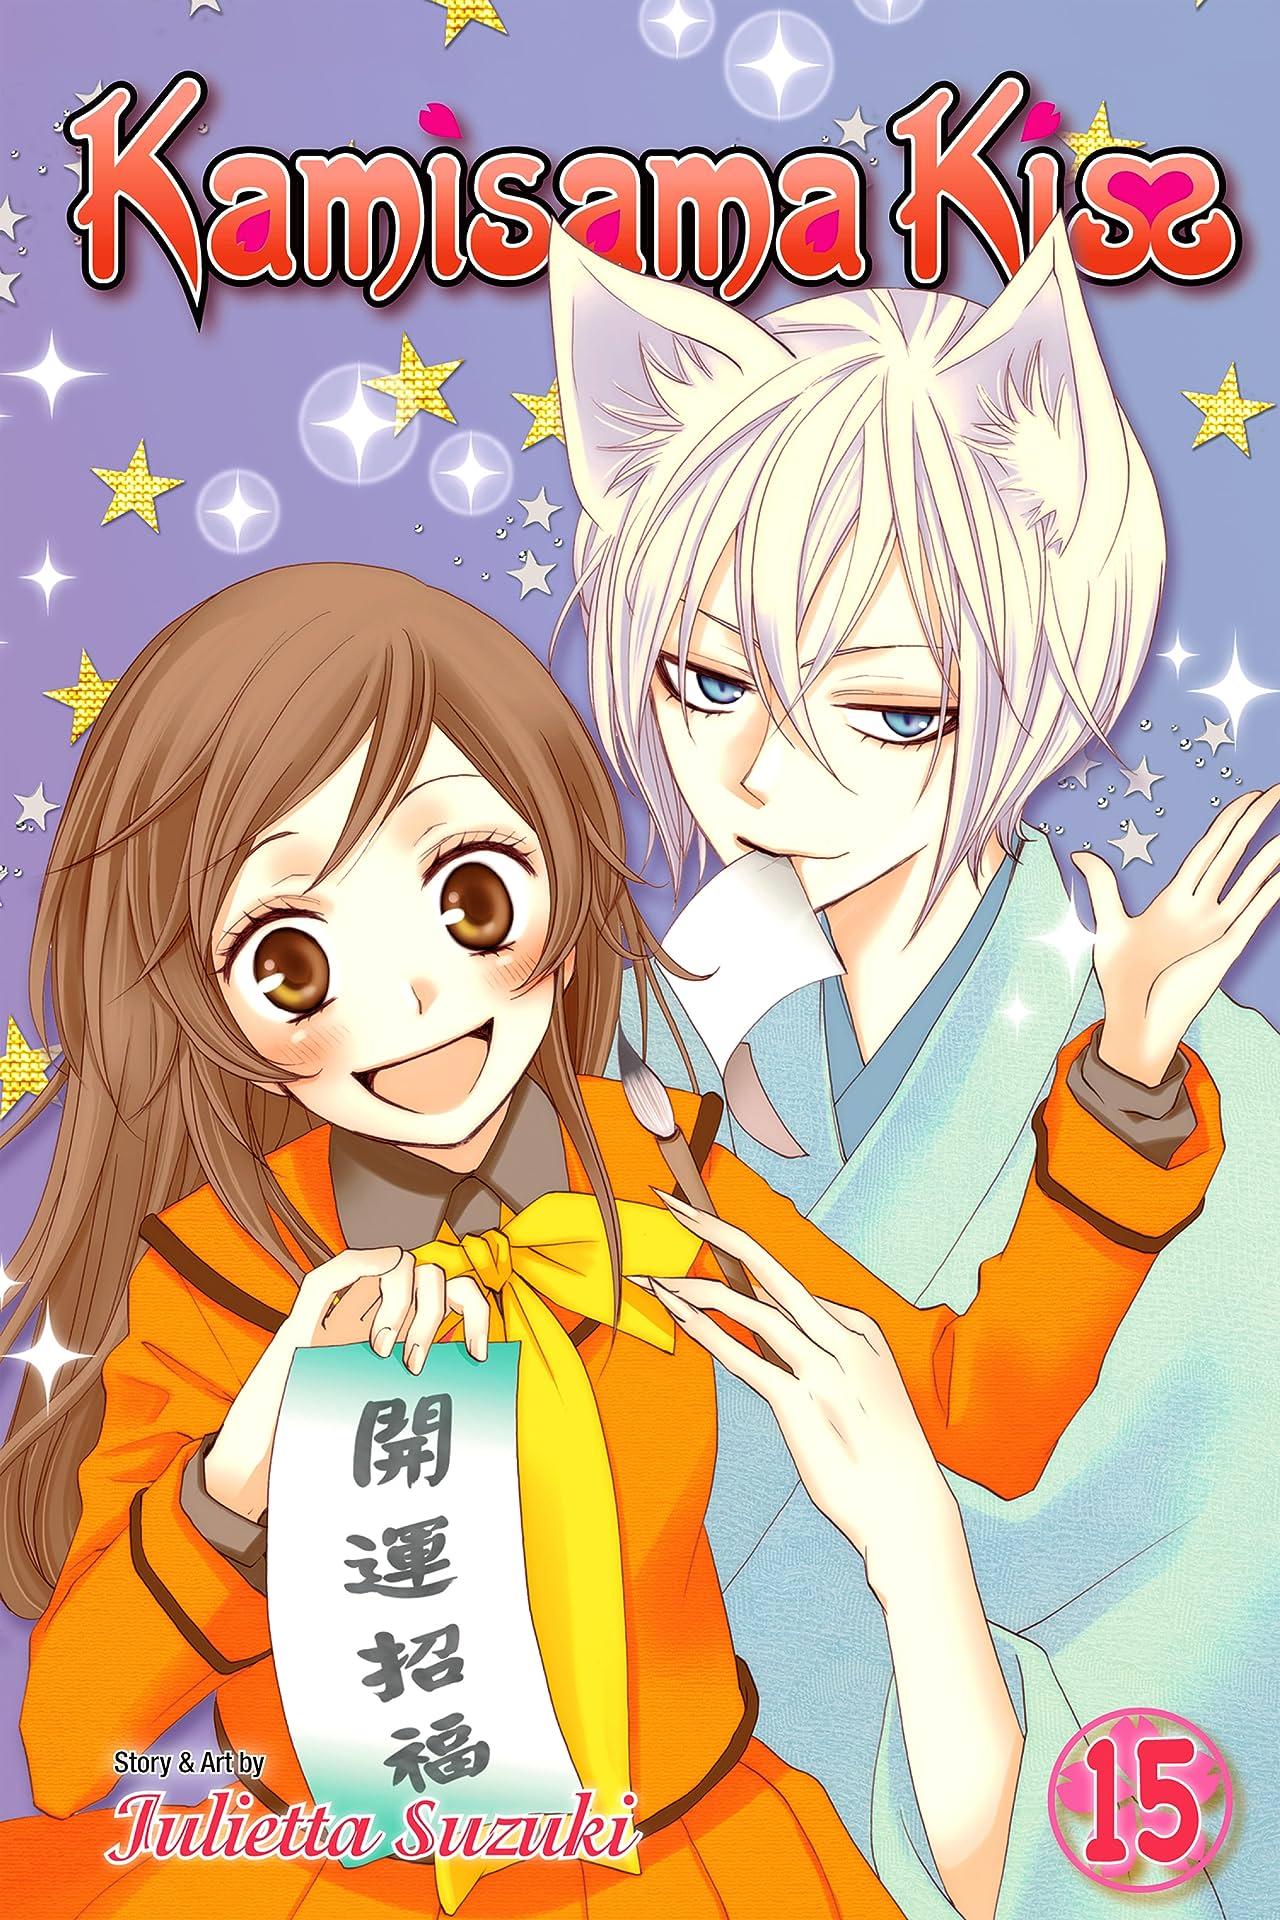 Kamisama Kiss Vol. 15